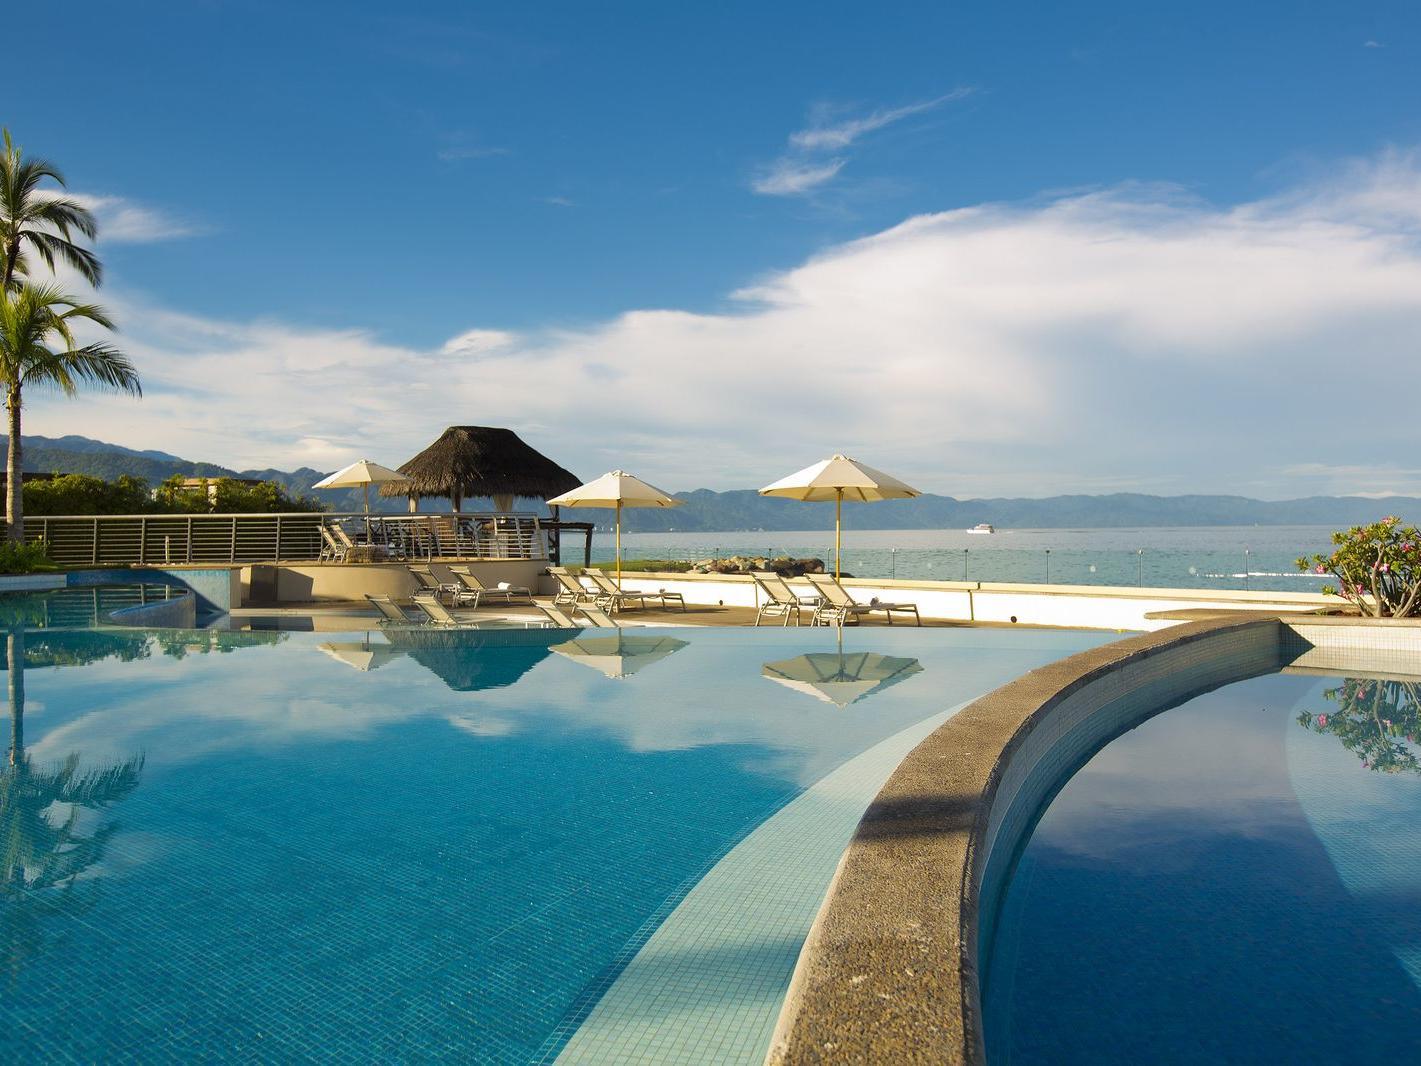 Pool overlooking the beach